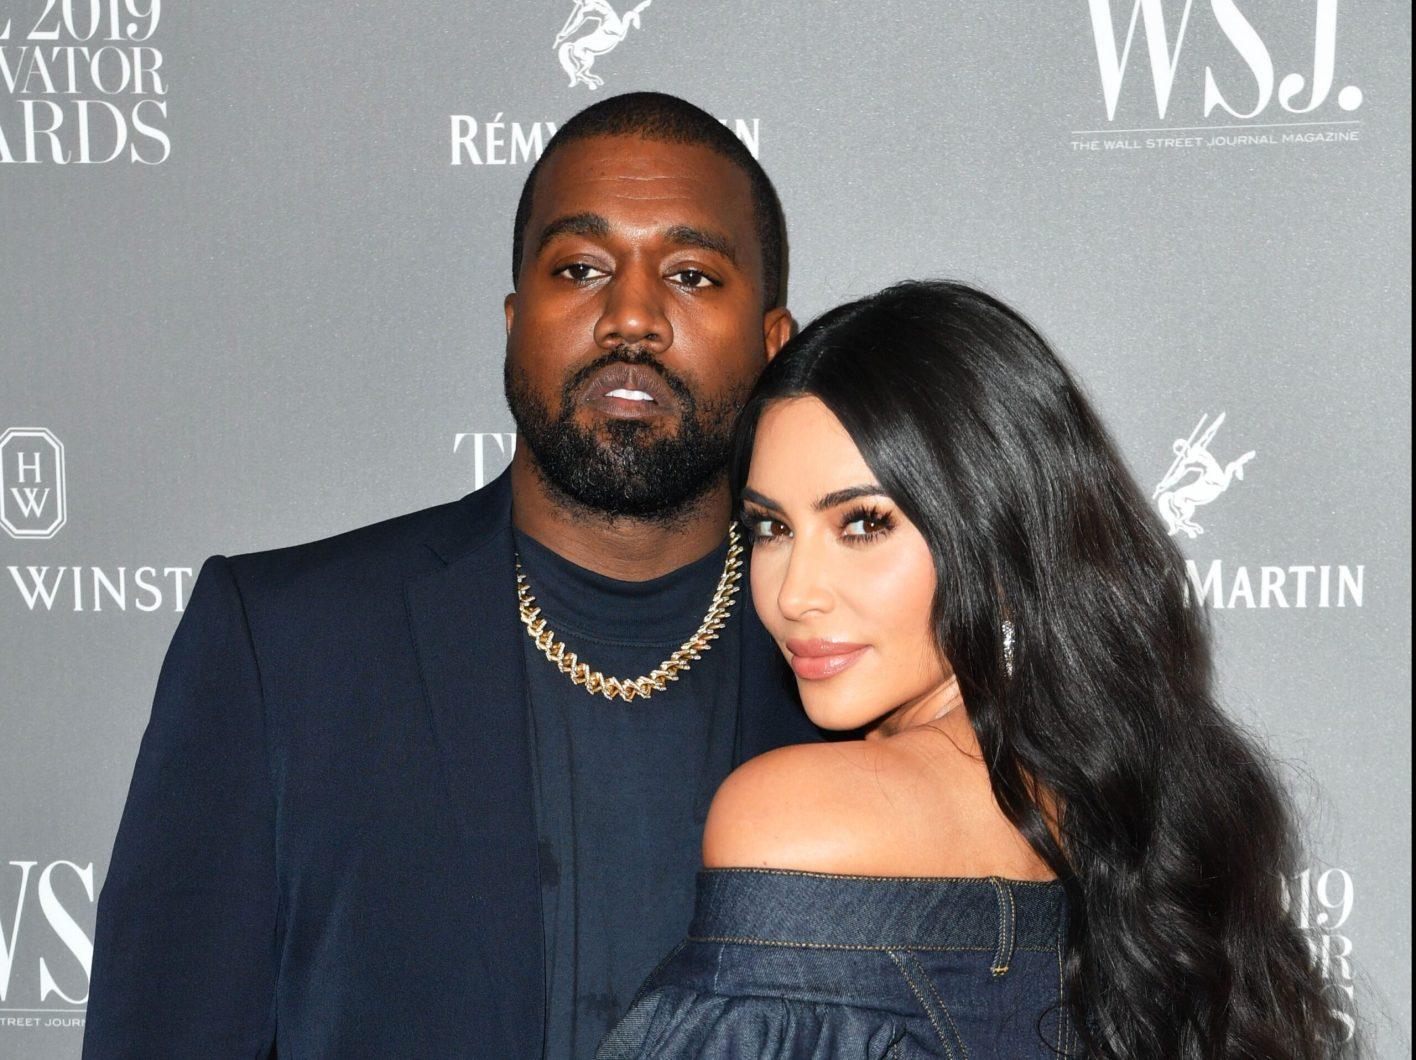 Real reason why Kim Kardashian West divorced Kanye West